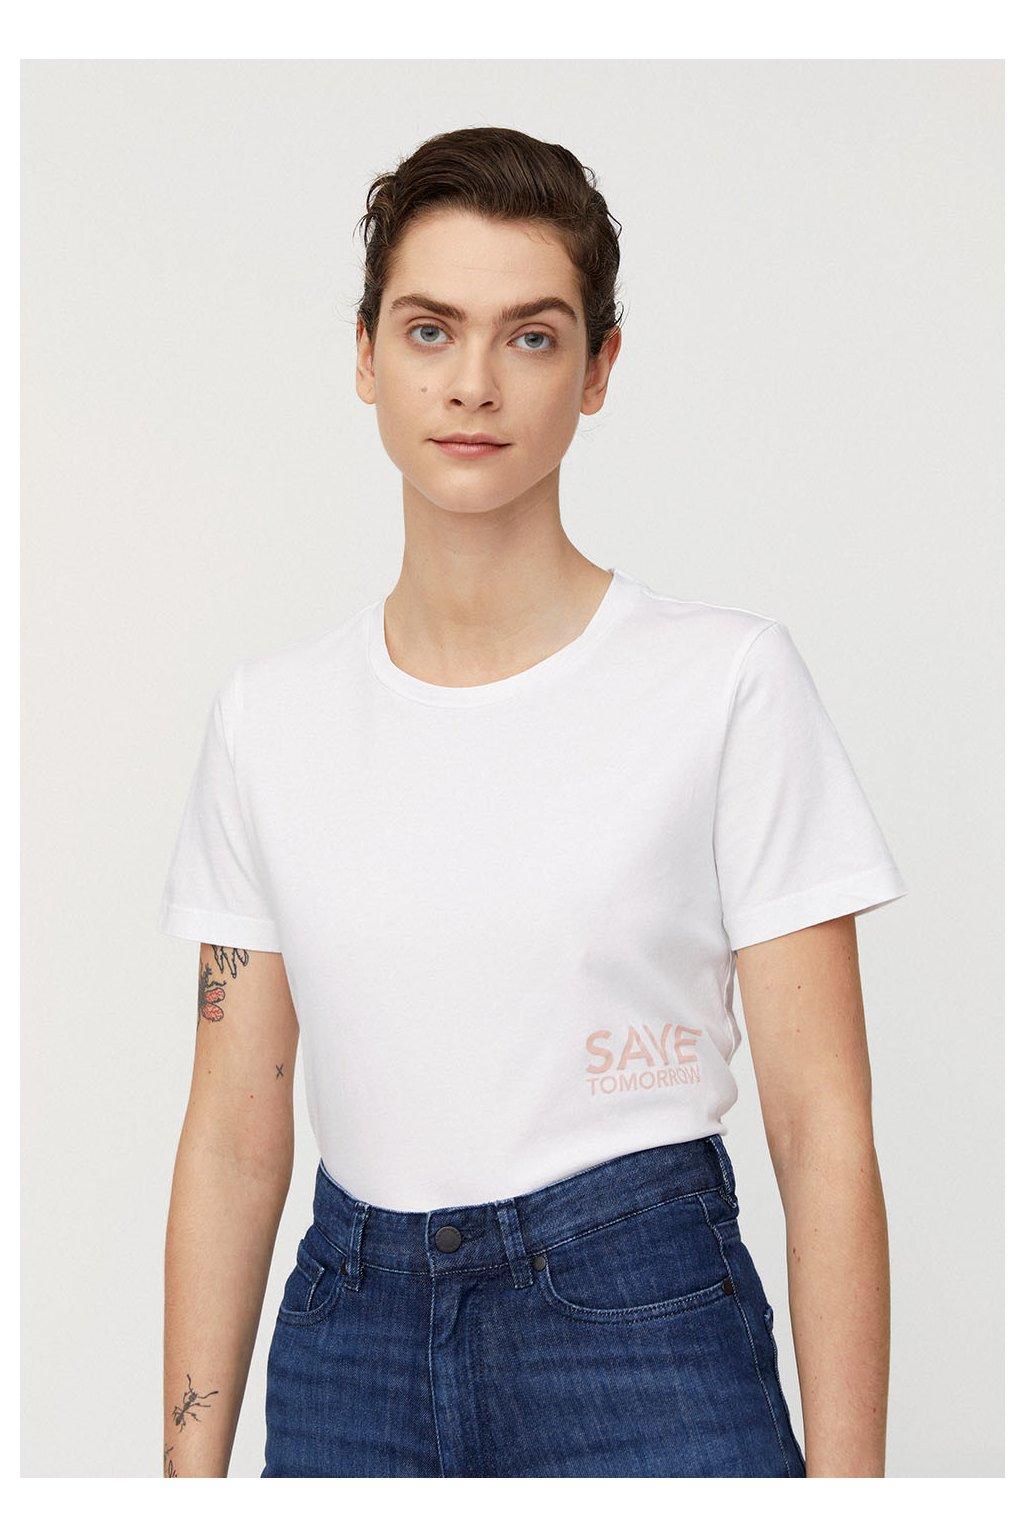 "Dámské tričko z biobavlny ""MARAA SAVE TOMORROW white"" (Velikost L)"